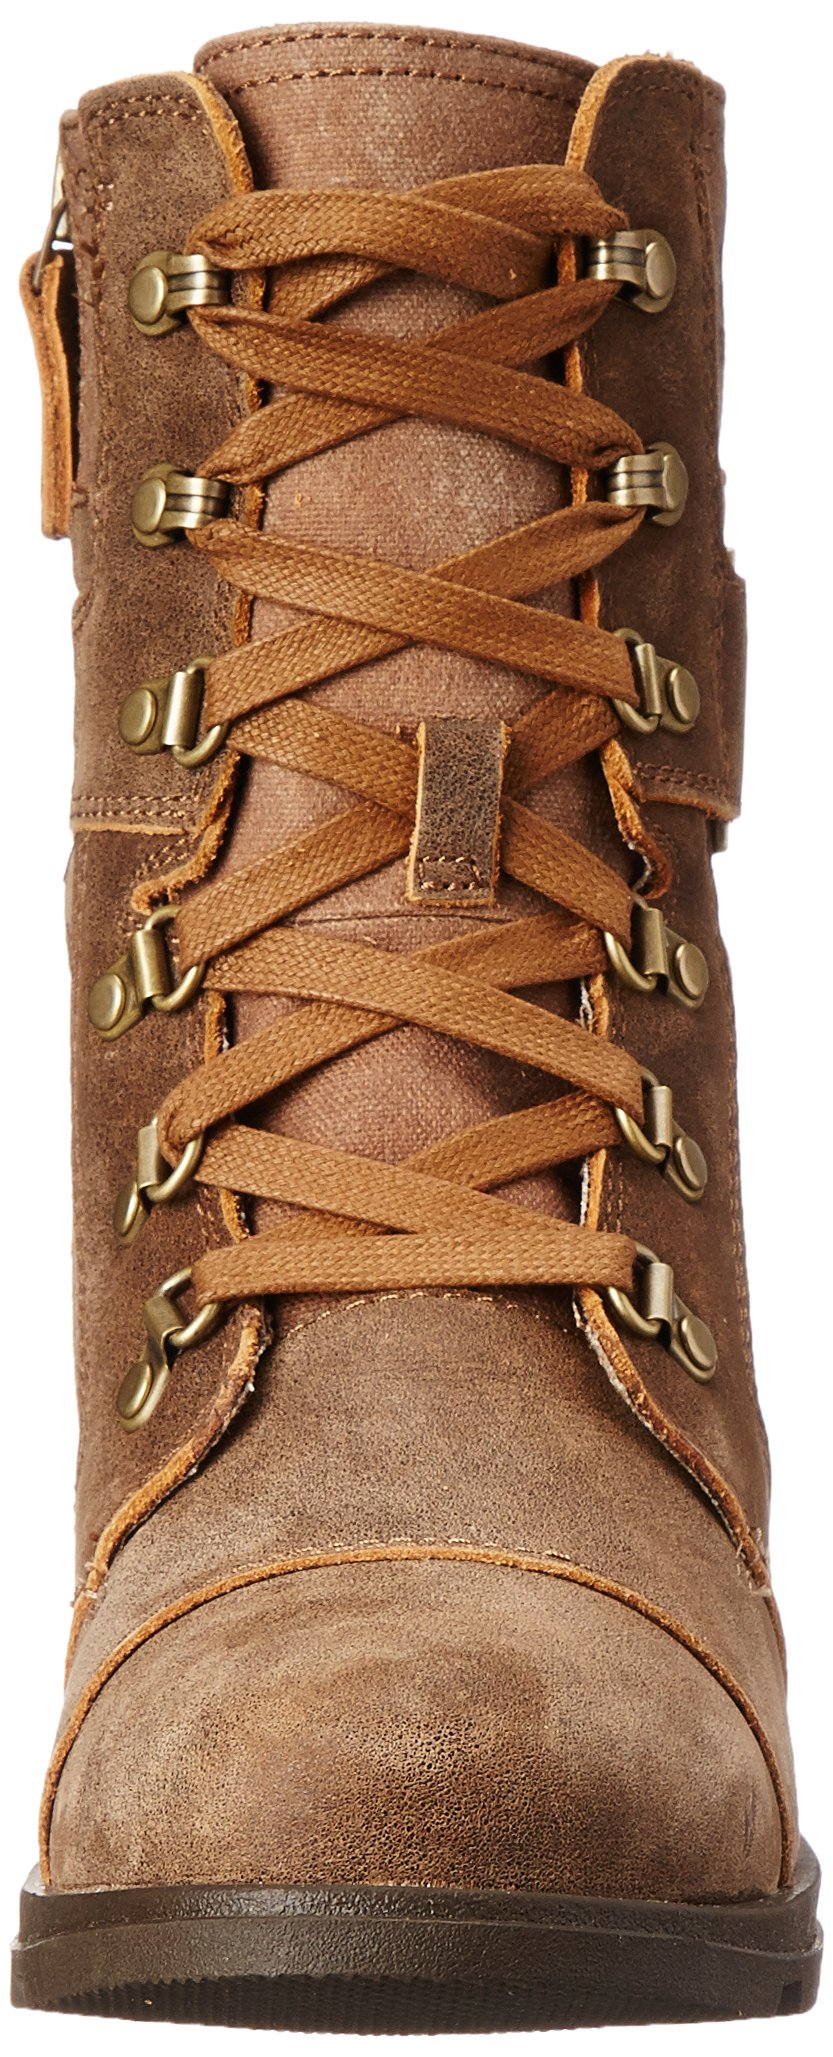 Sorel Women's Major Carly Snow Boot, Nutmeg, Flax, 8 B US by SOREL (Image #4)